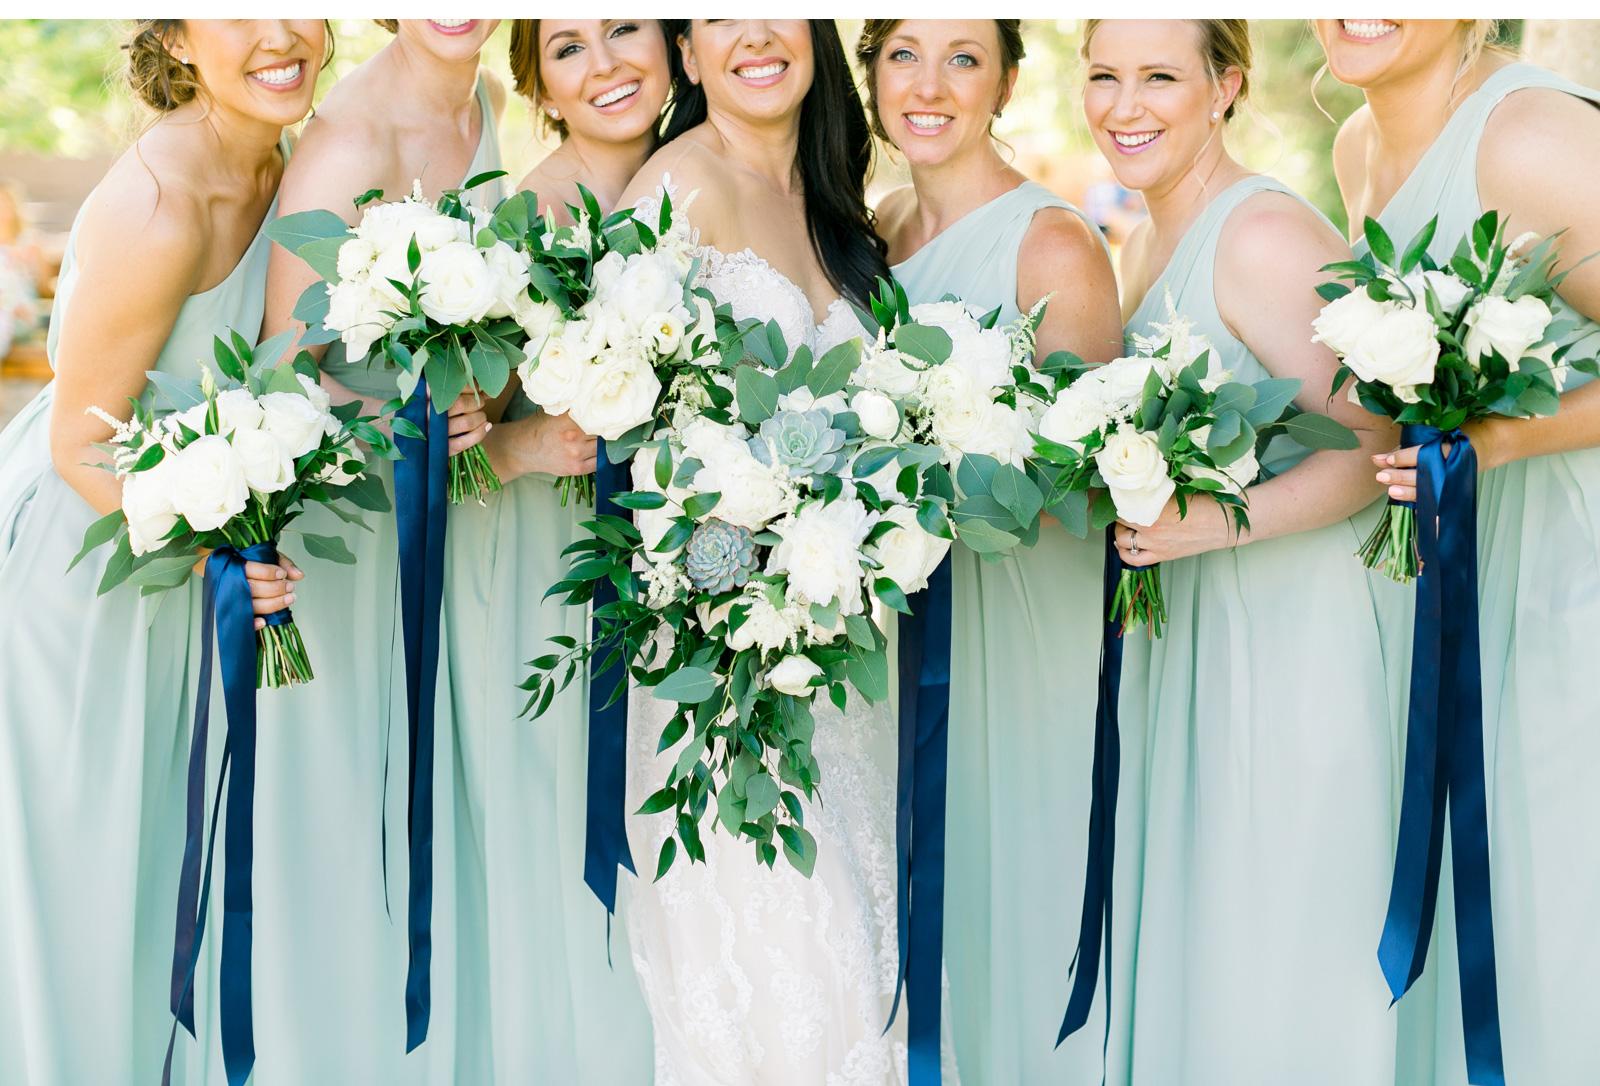 Southern-California-Weddings-Natalie-Schutt-Photography-Weddings_13.jpg